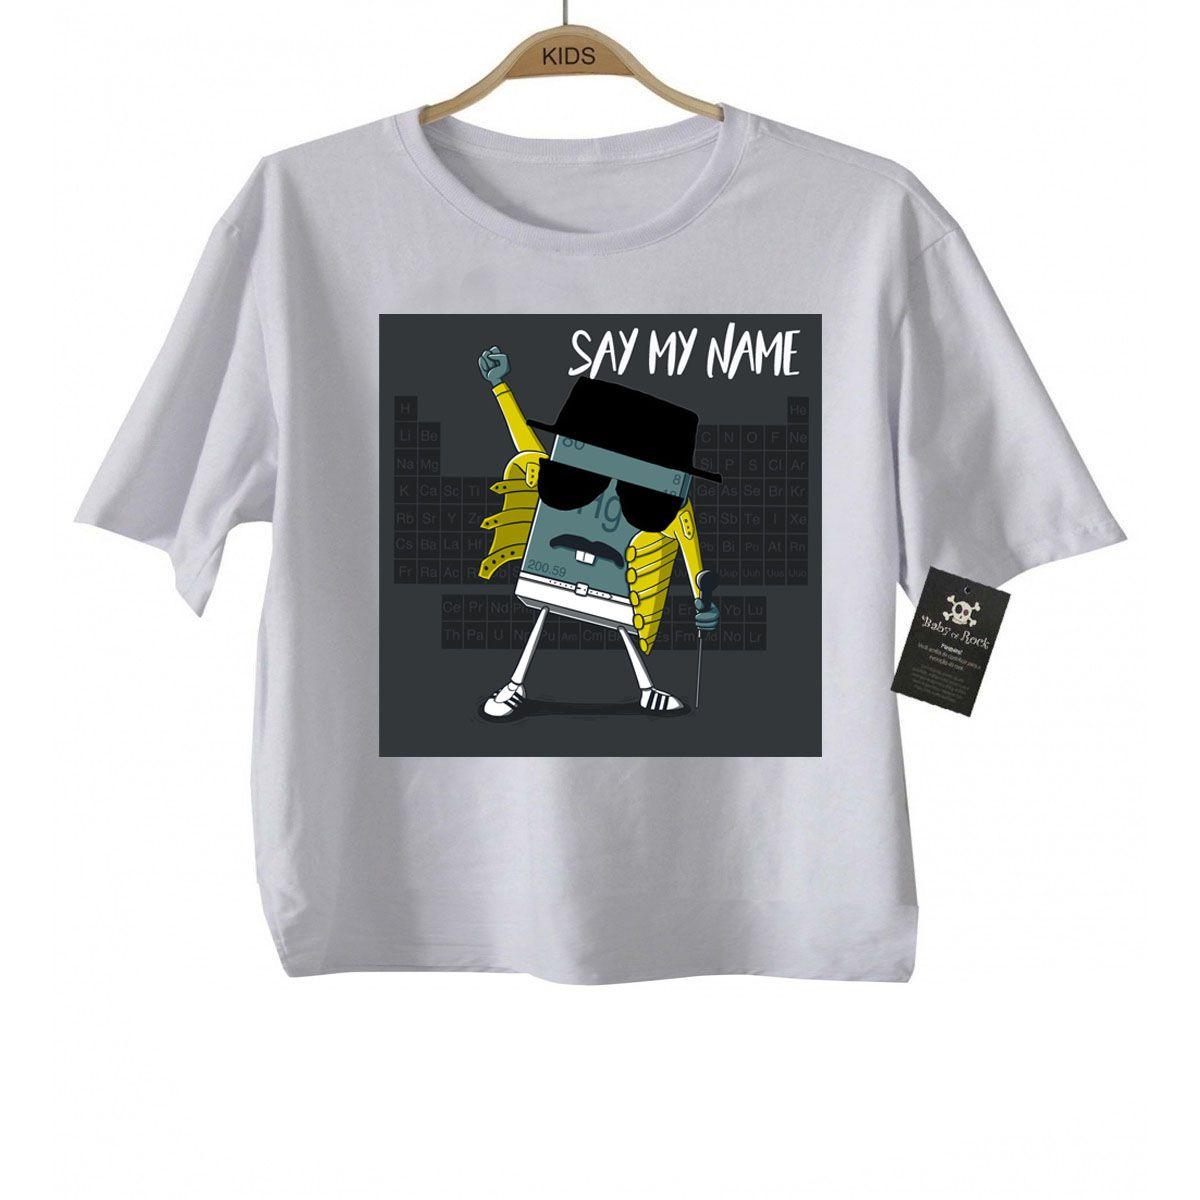 Camiseta Infanitl Baby Freddy Mercury Queen Heisenberg  - Caricato - White  - Baby Monster S/A